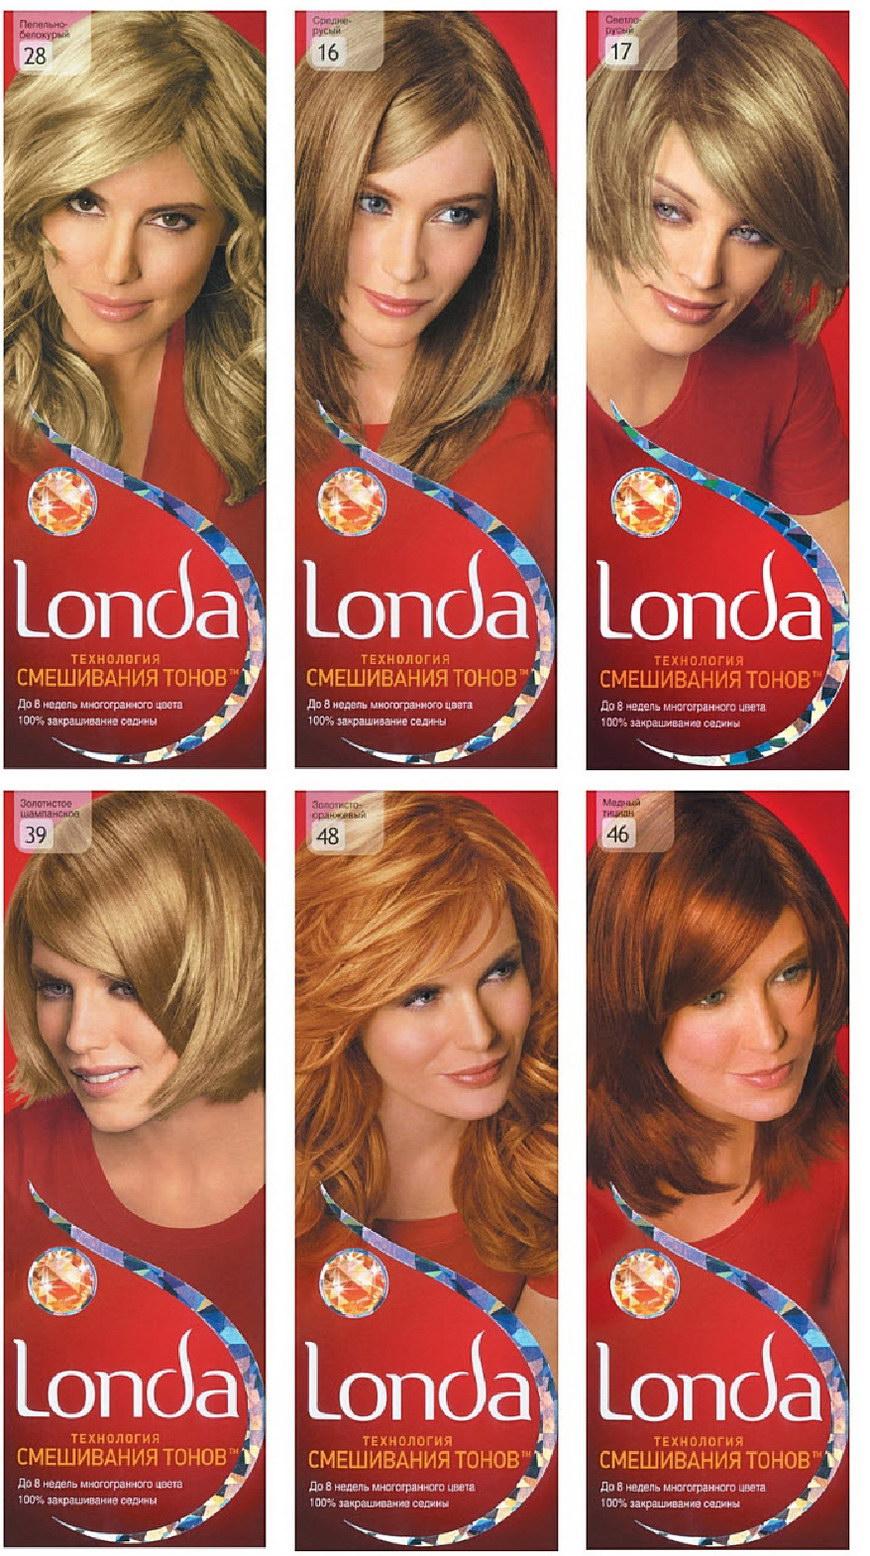 Краска для волос лондаколор палитра цветов фото на волосах